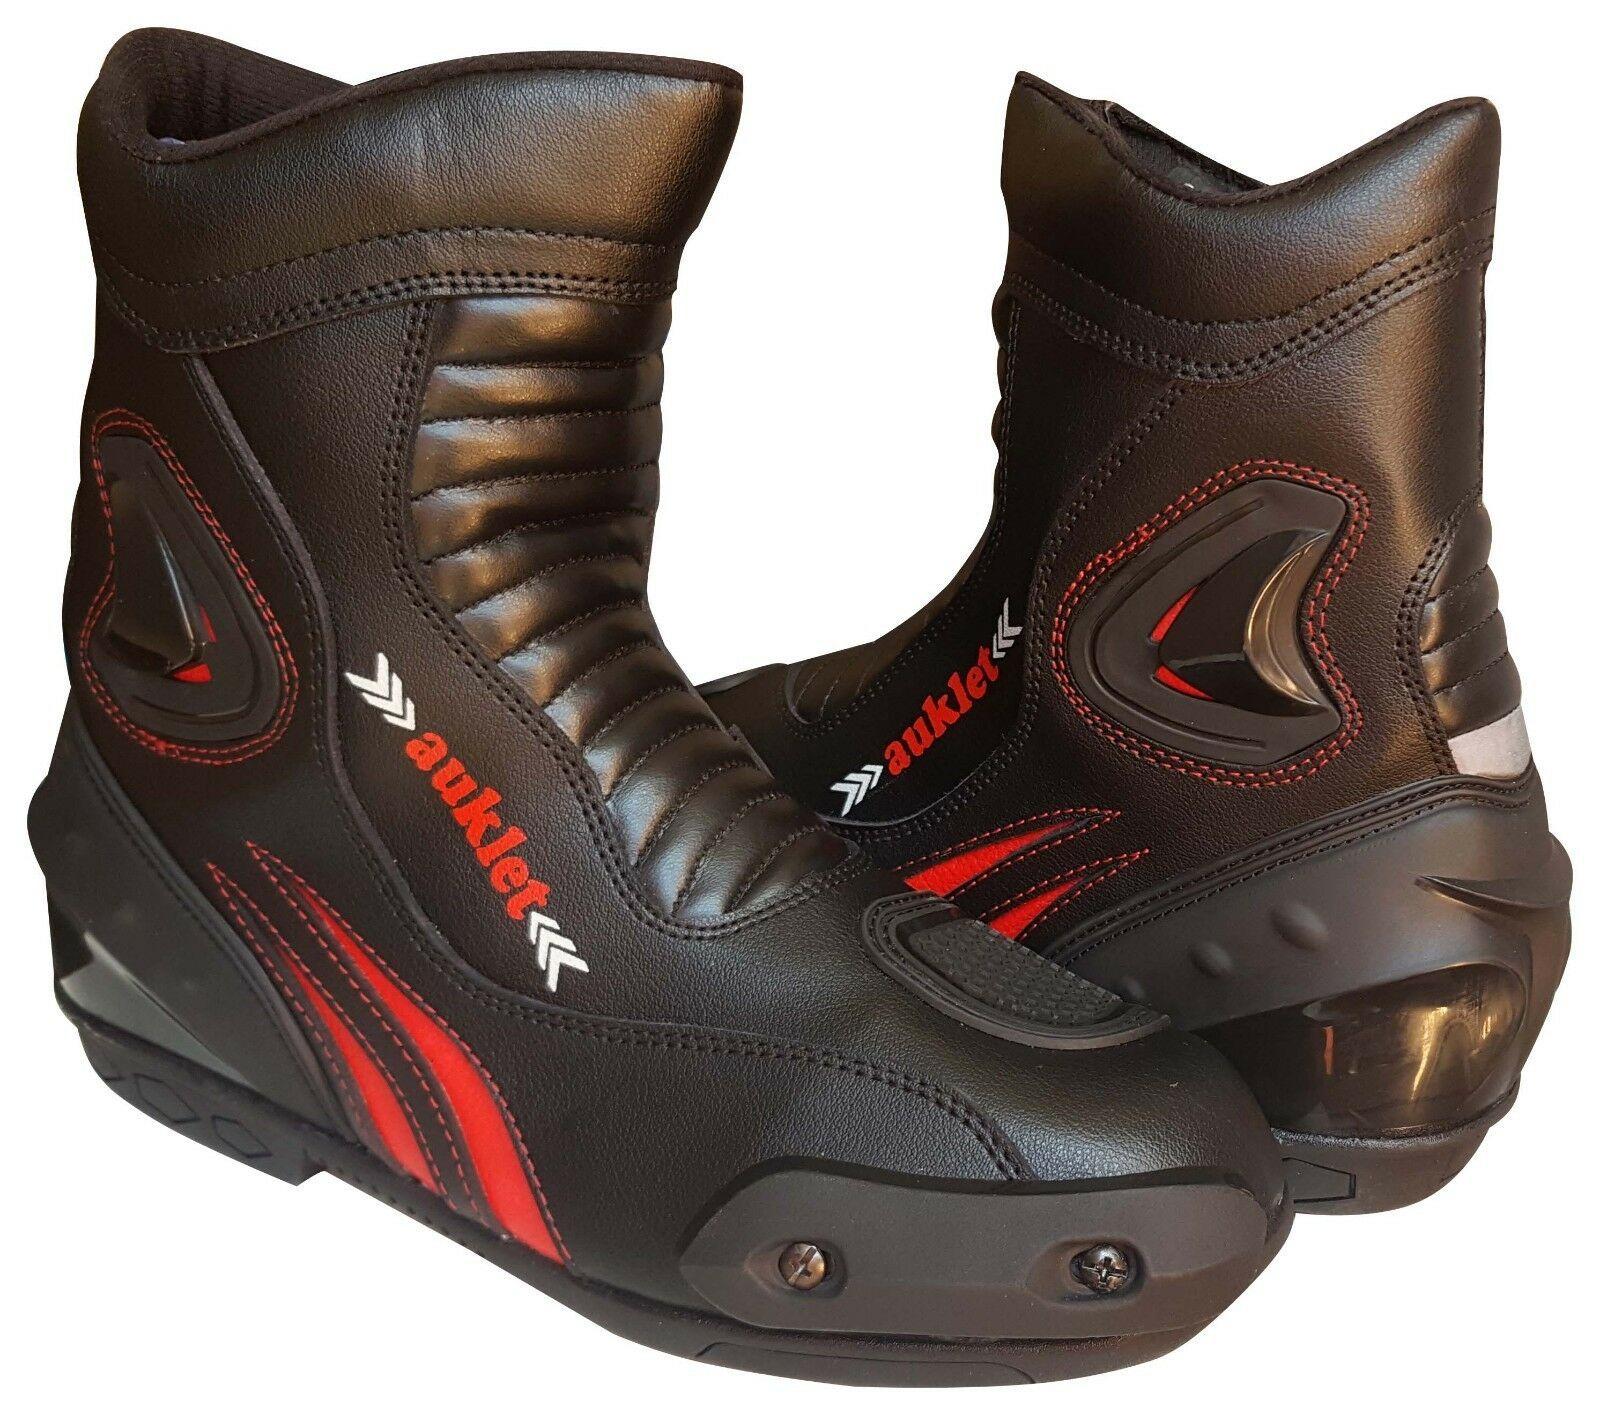 Scarpa Stivale Motociclismo Calzatura Sportiva Moto Auklet